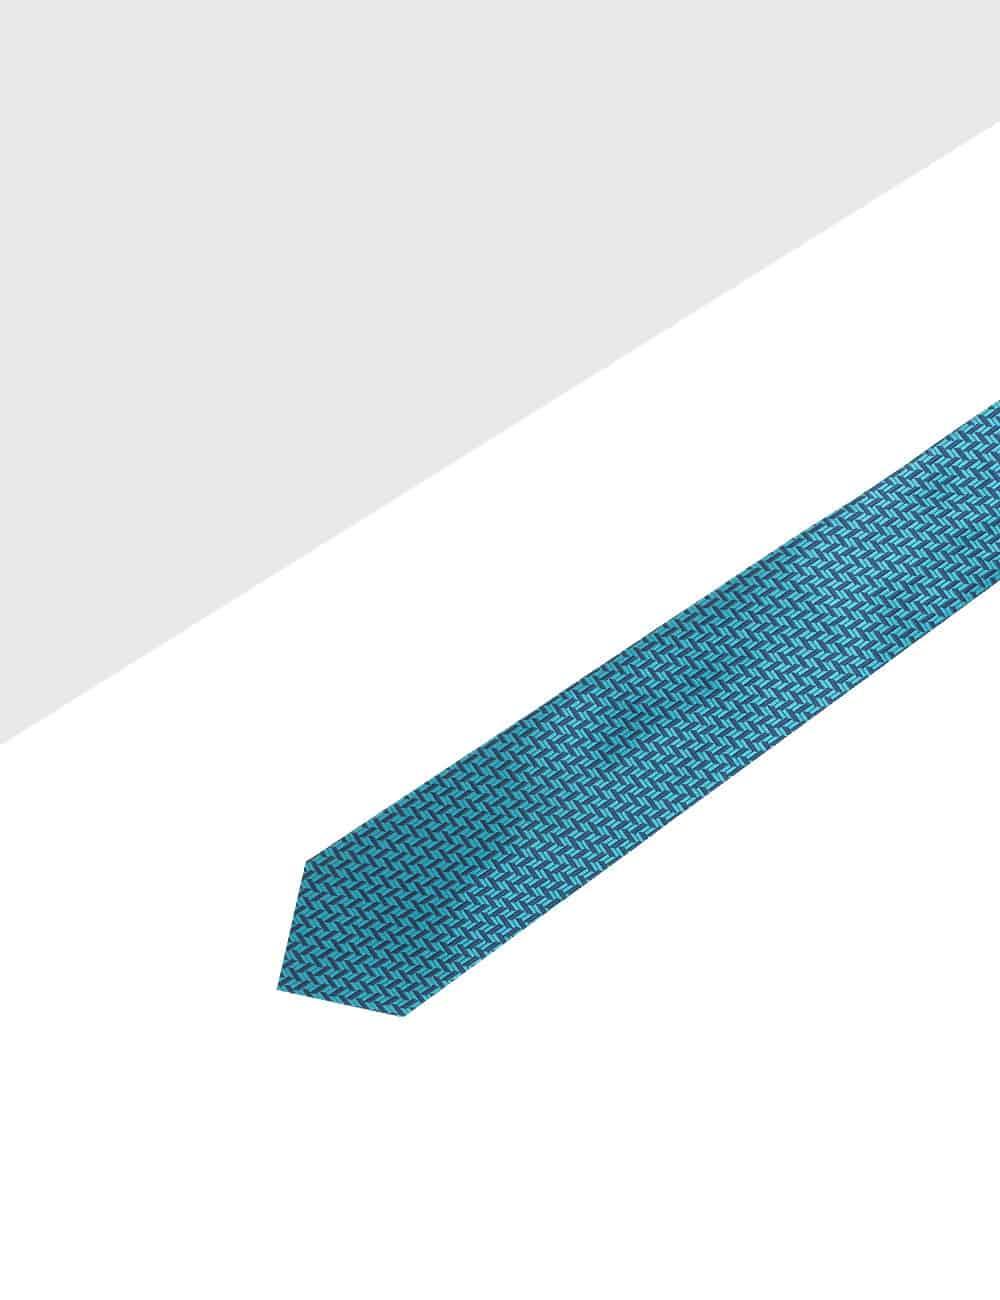 Turquoise and Navy Herringbone Spill Resist Woven Necktie NT28.9